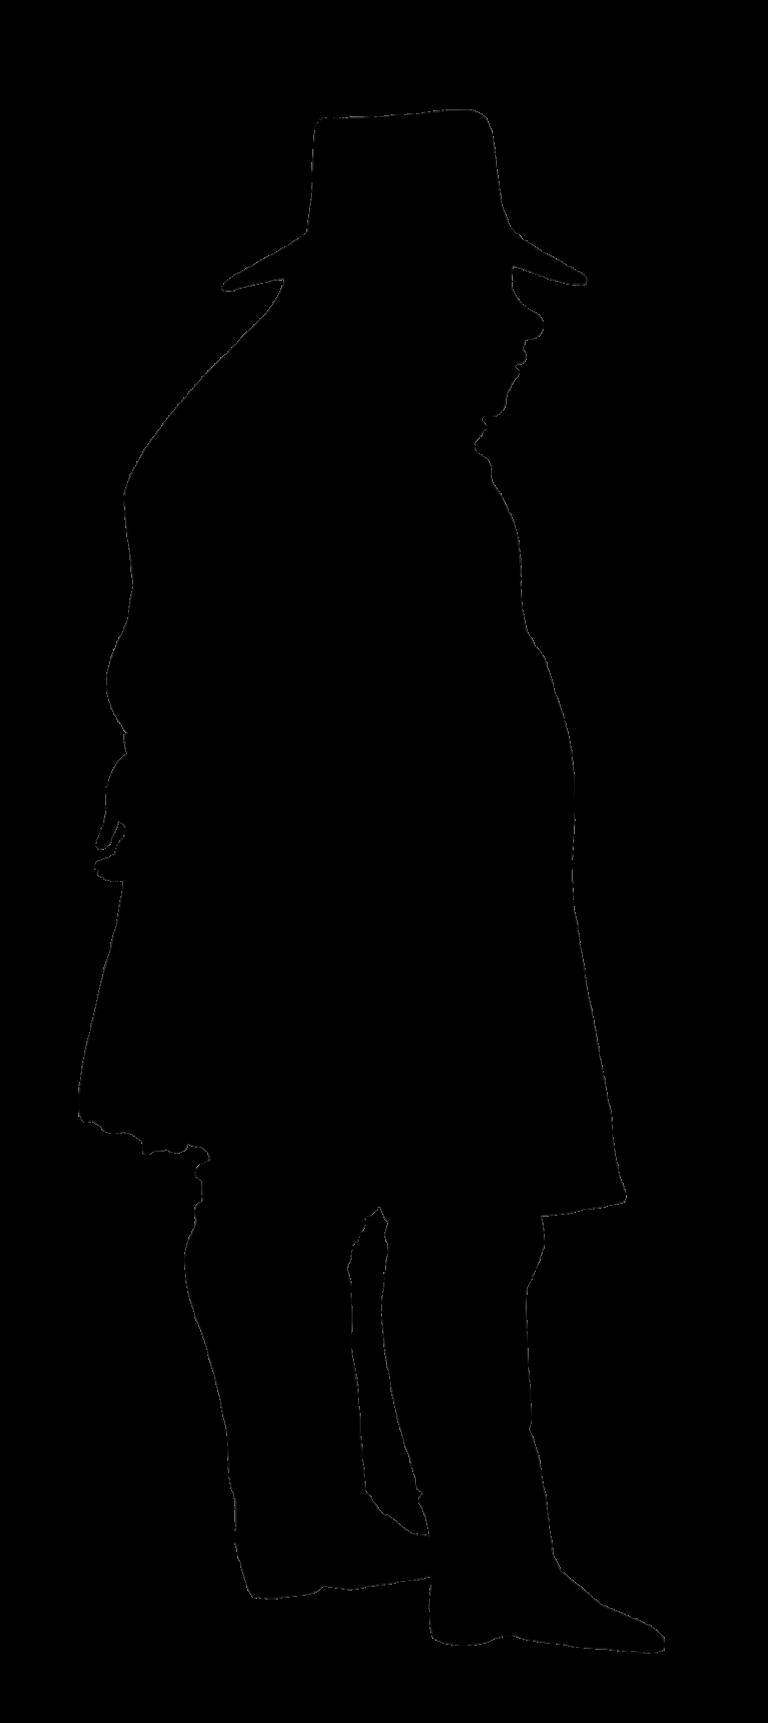 768x1723 Victorian Era Silhouette Gentleman Clip Art